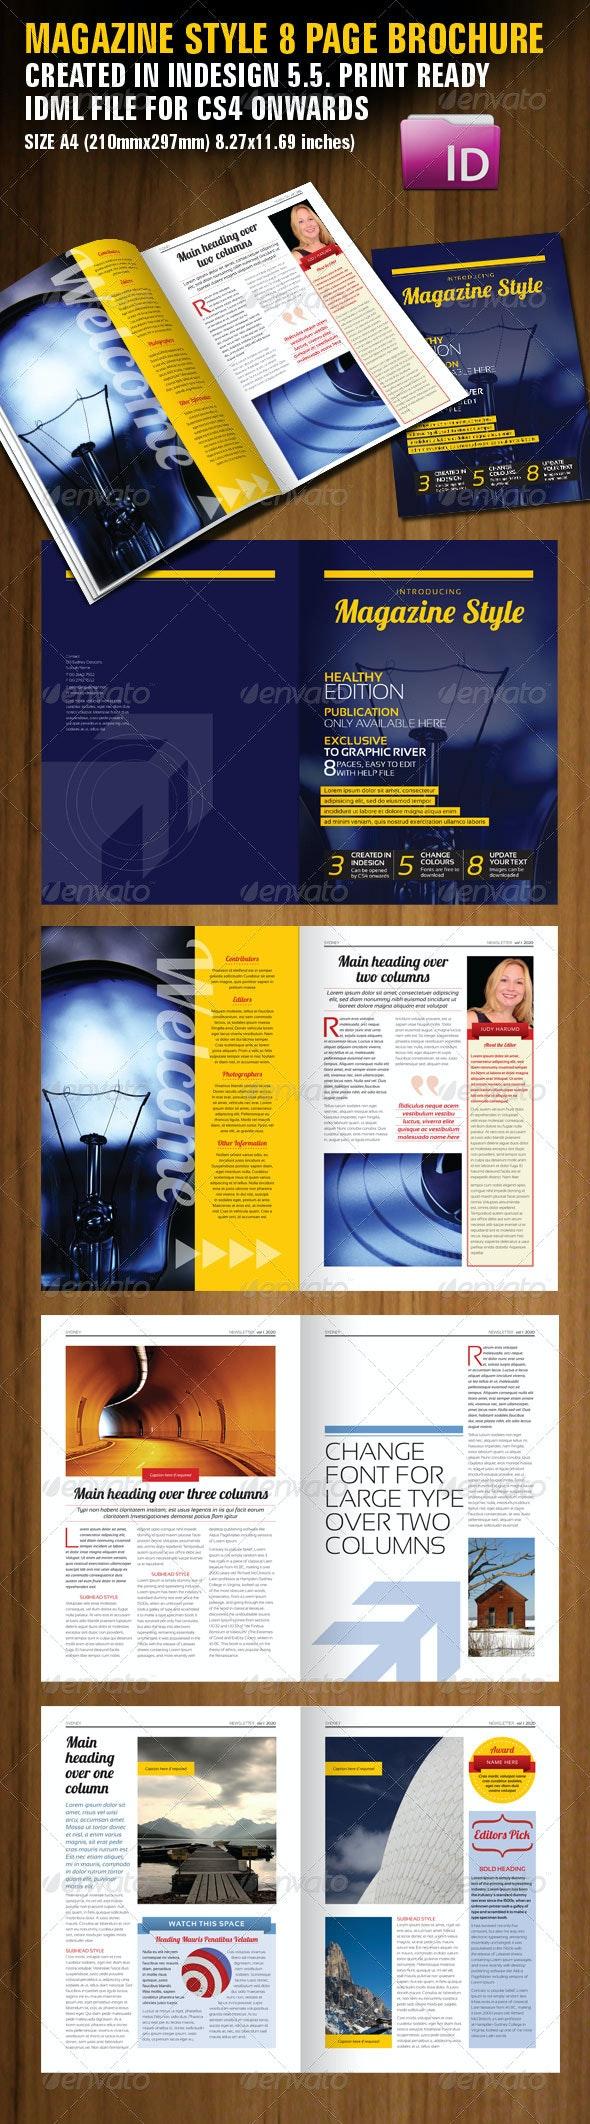 Magazine Style Brochure - Corporate Brochures